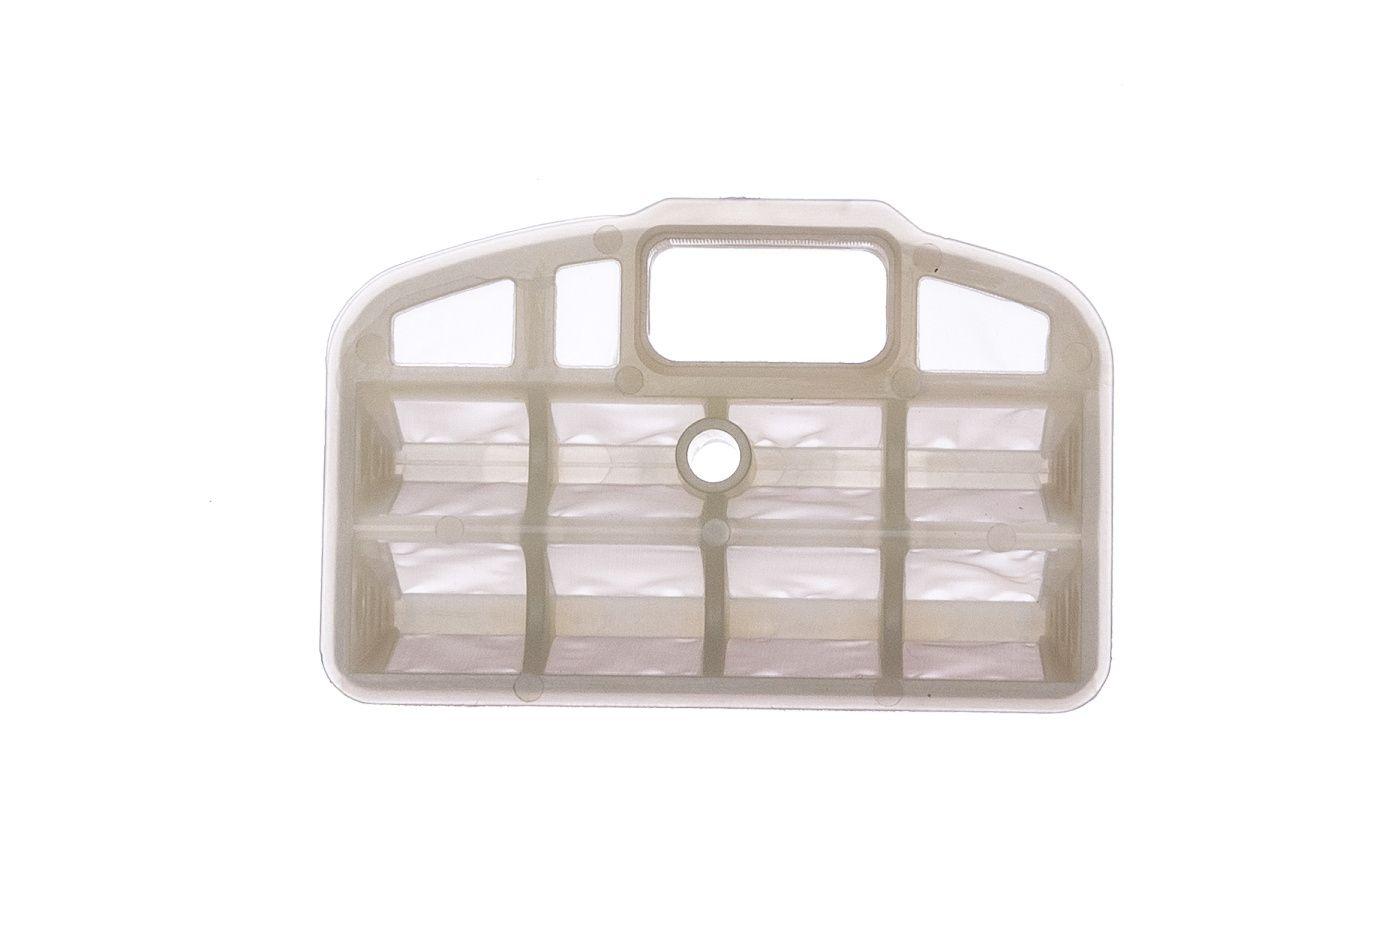 Vzduchový filtr Oleo-mac 937 941